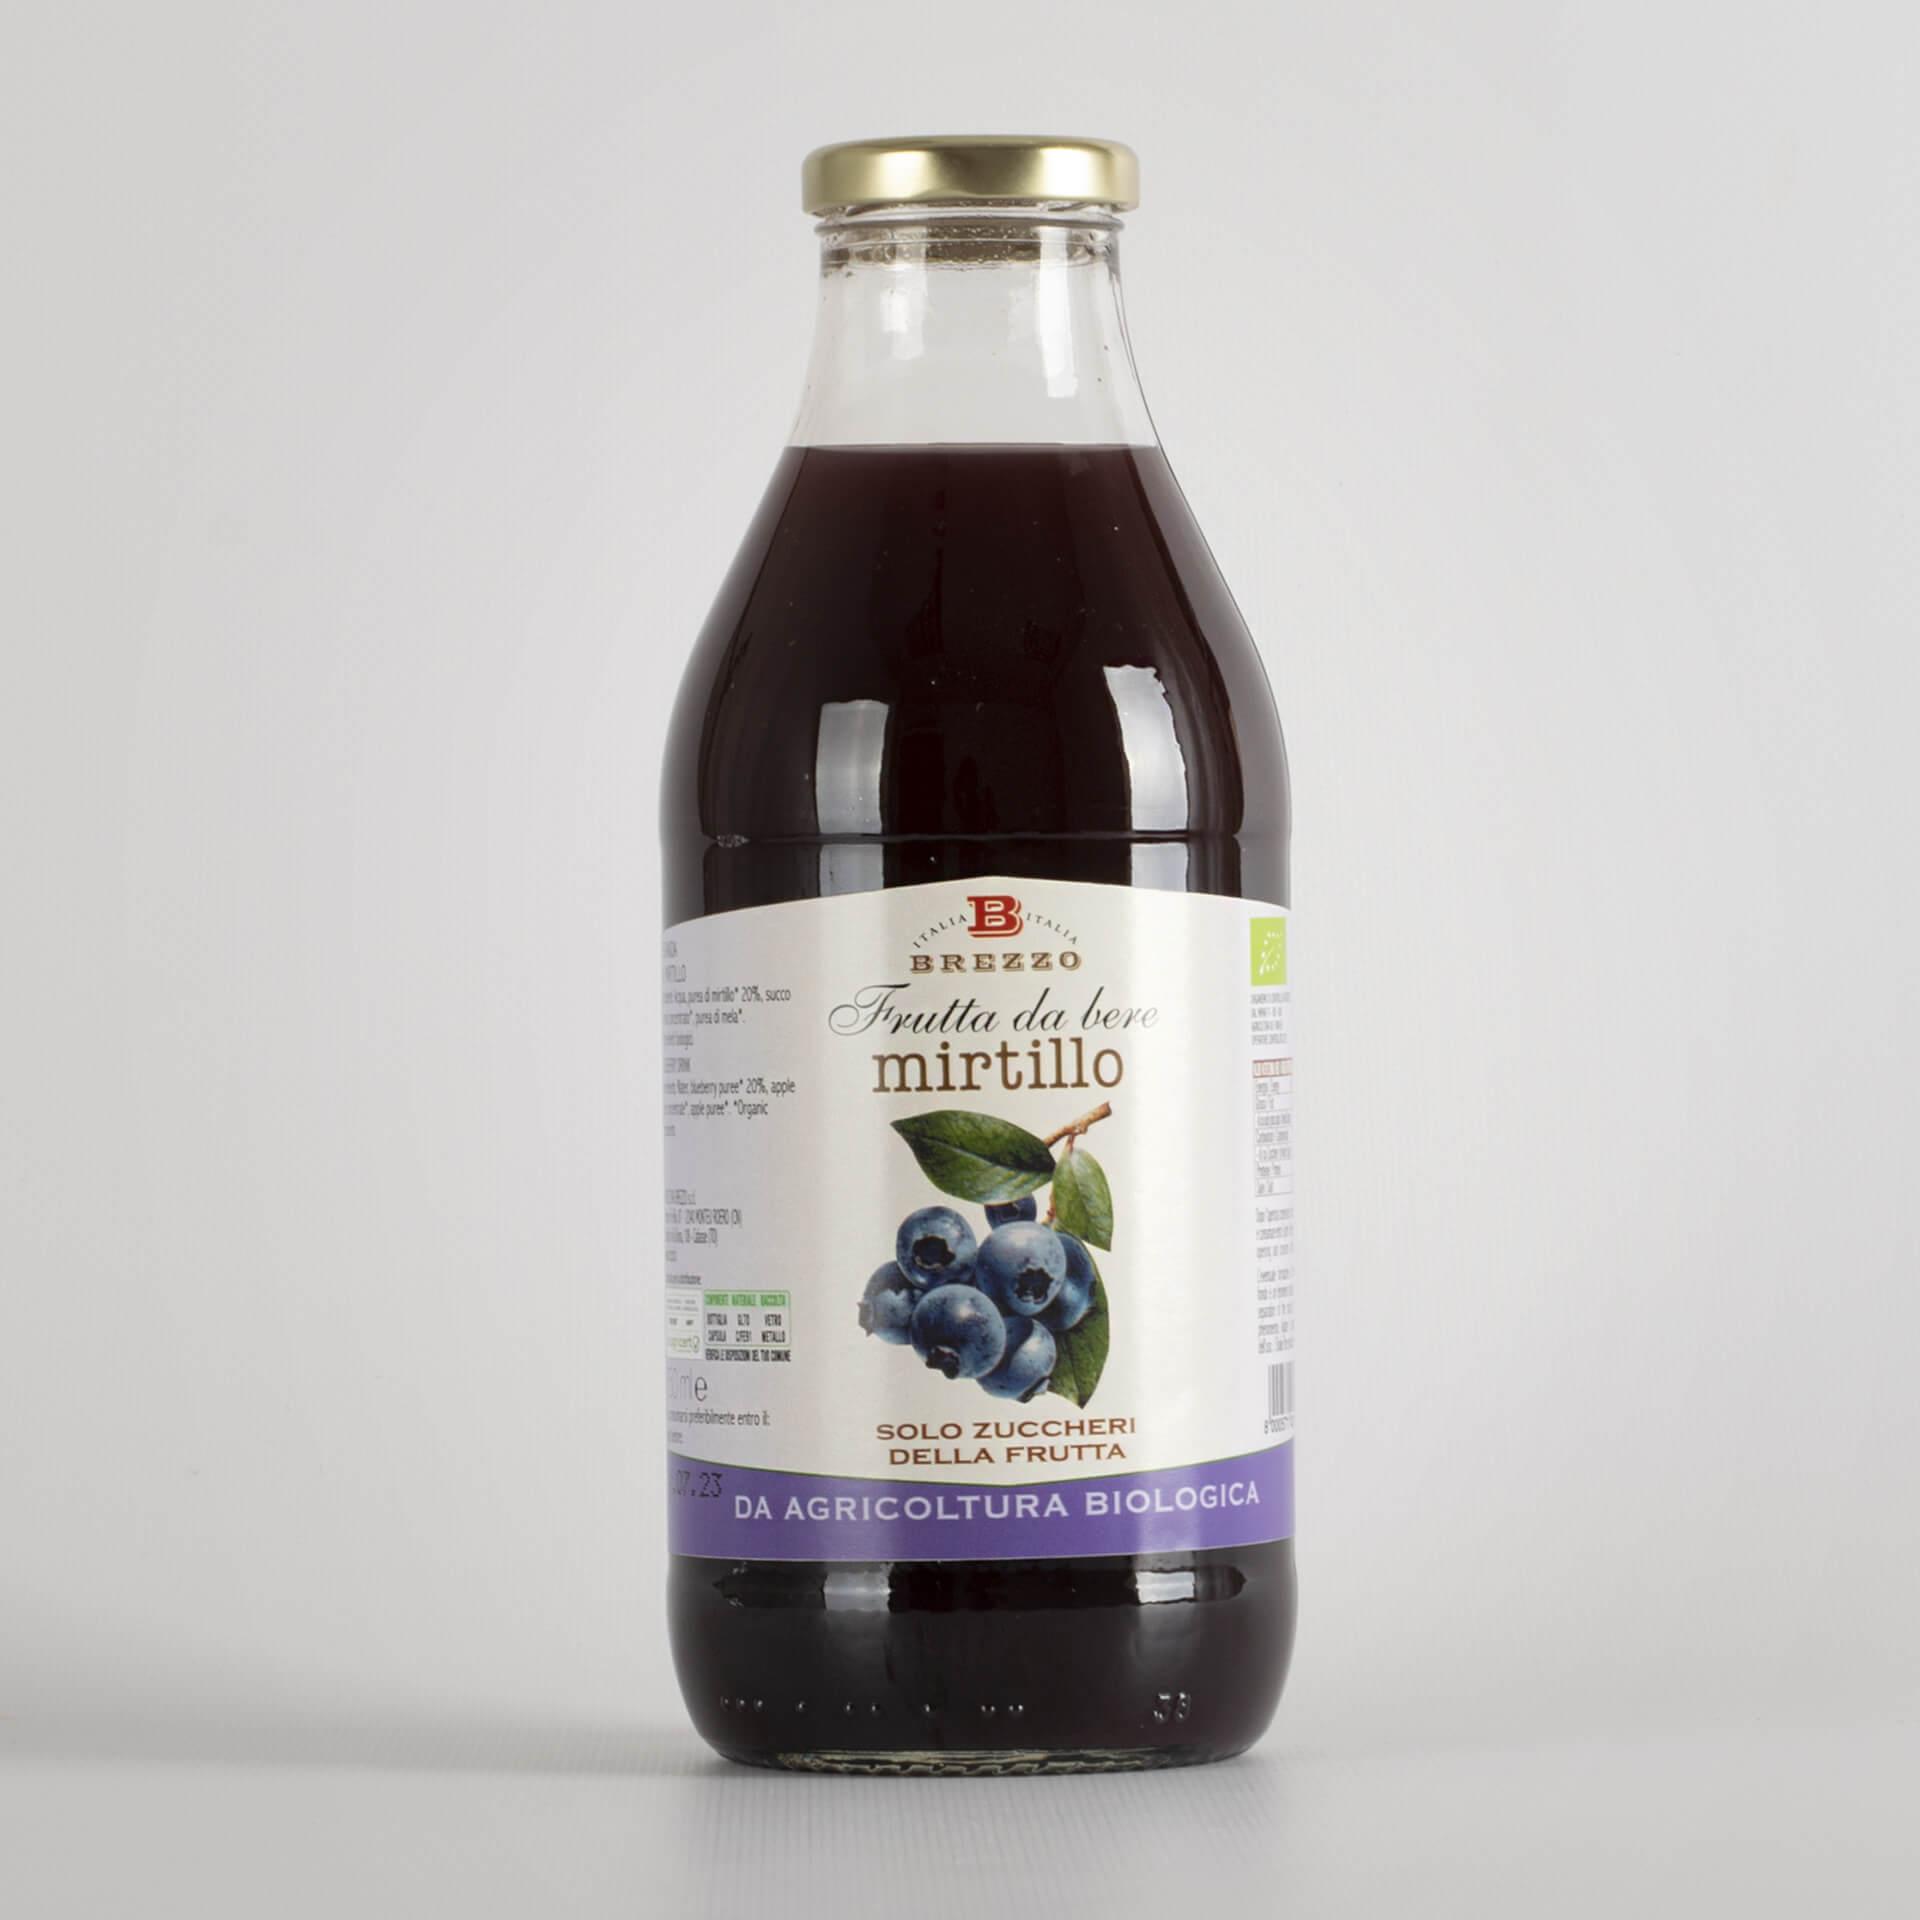 The Fruit Drink Blueberry Bio